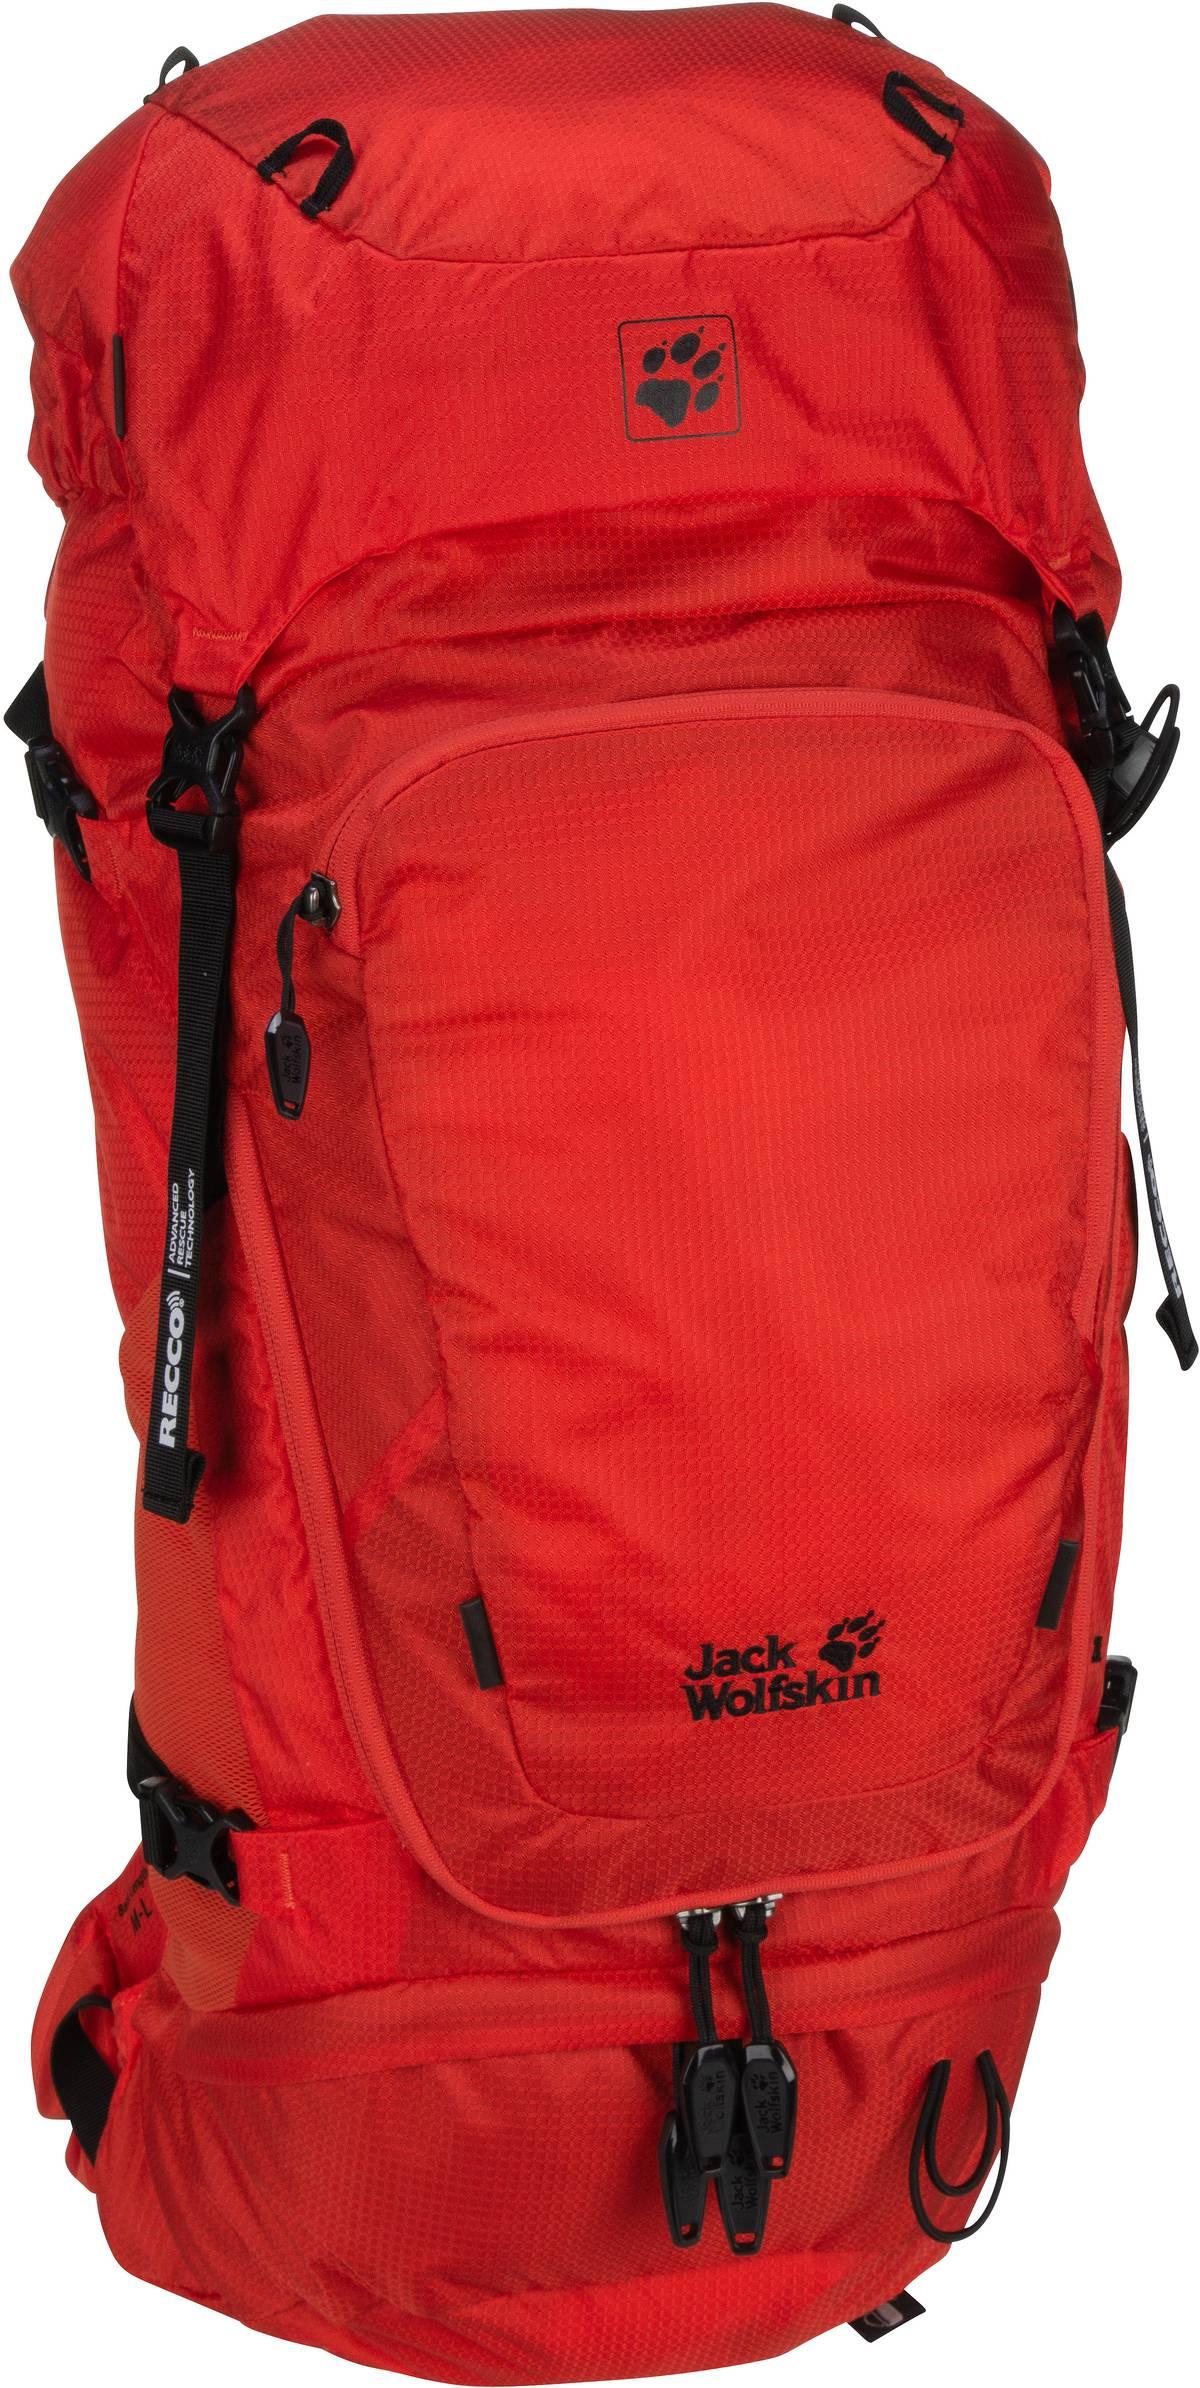 Wanderrucksack Orbit 28 Pack Recco M-L Lava Red (28 Liter)